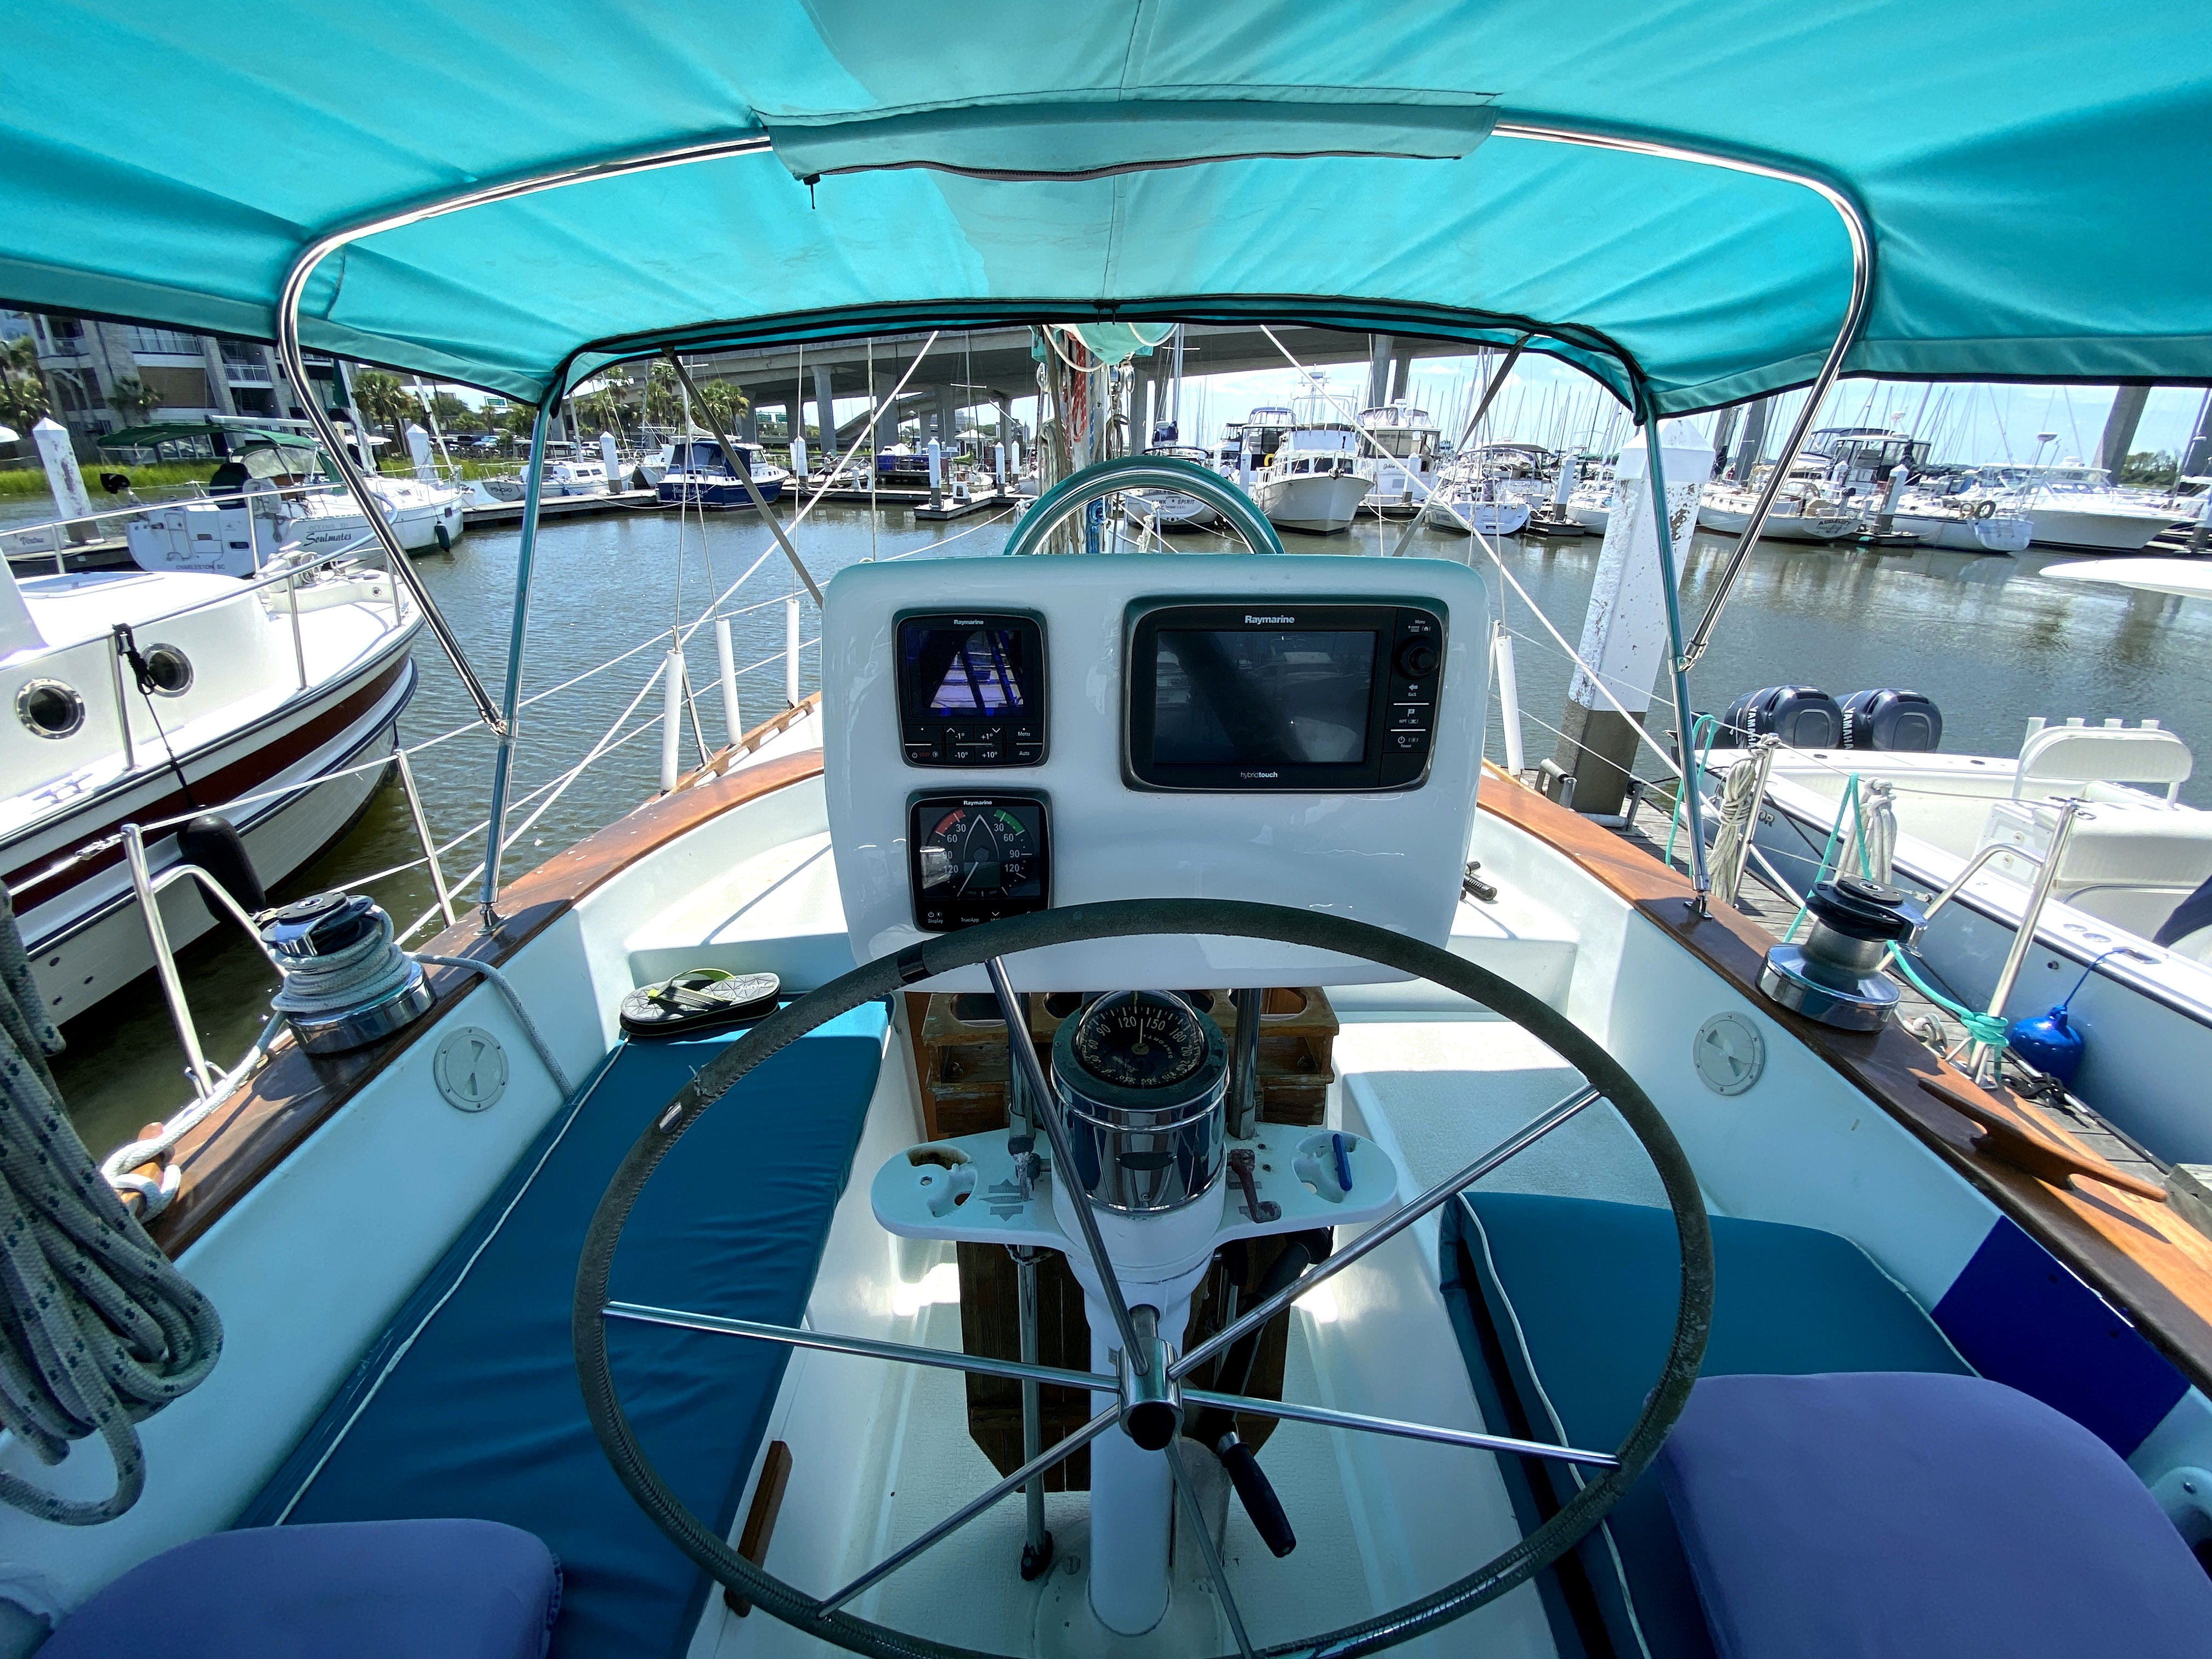 Endeavour 40 Center Cockpit - Endeavour 40 Center Cockpit helm station